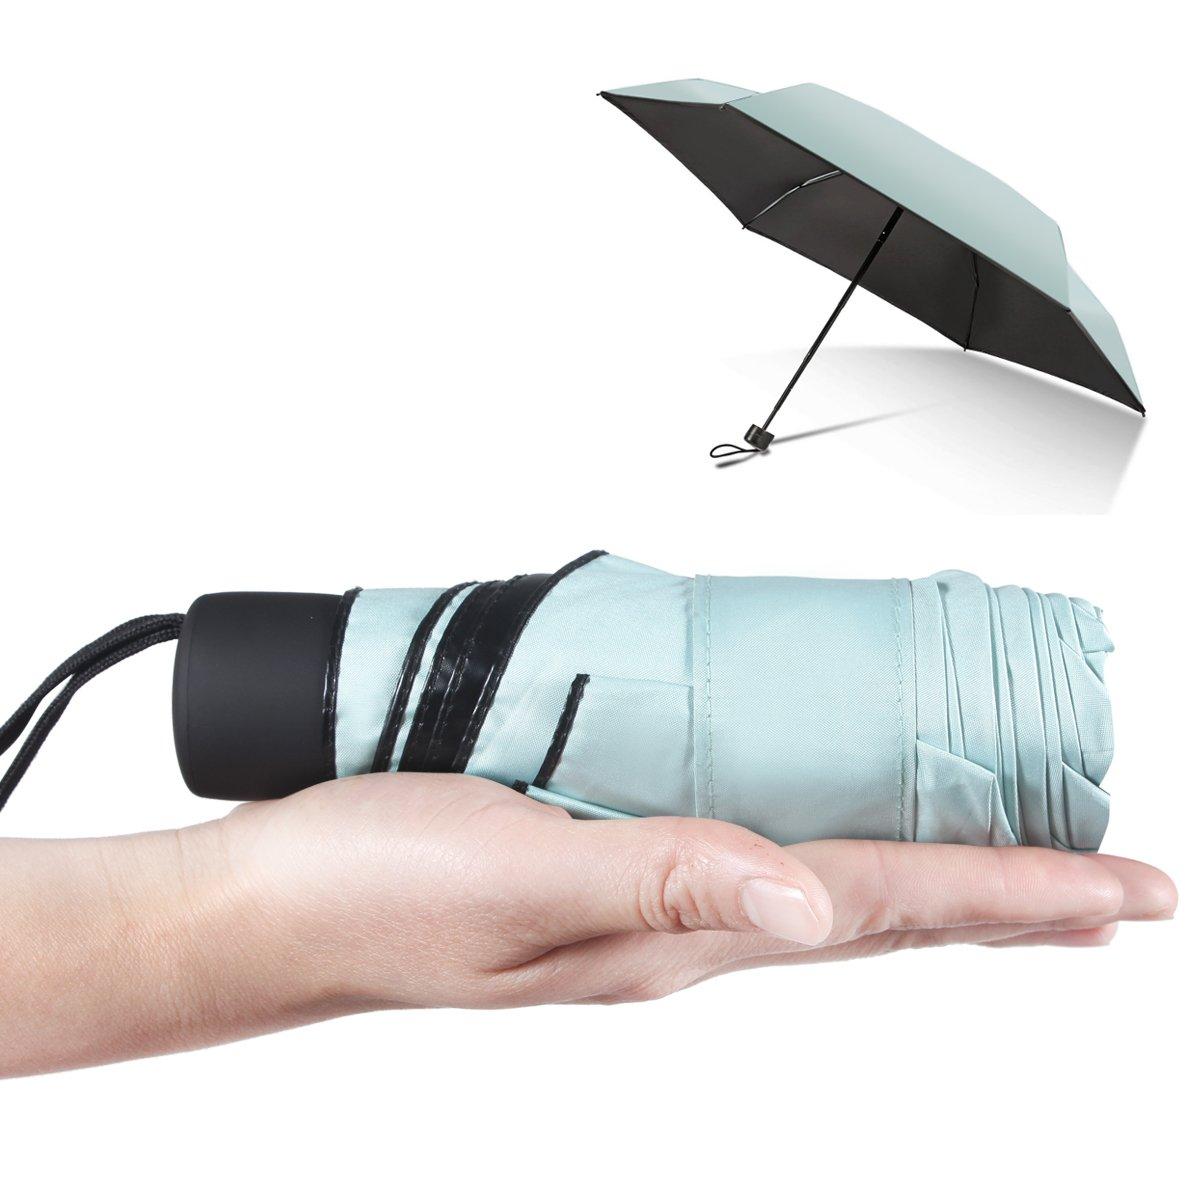 Mini Compact Travel Umbrella Outdoor Portable Sun Rain Umbrella UV Protect Mint Green